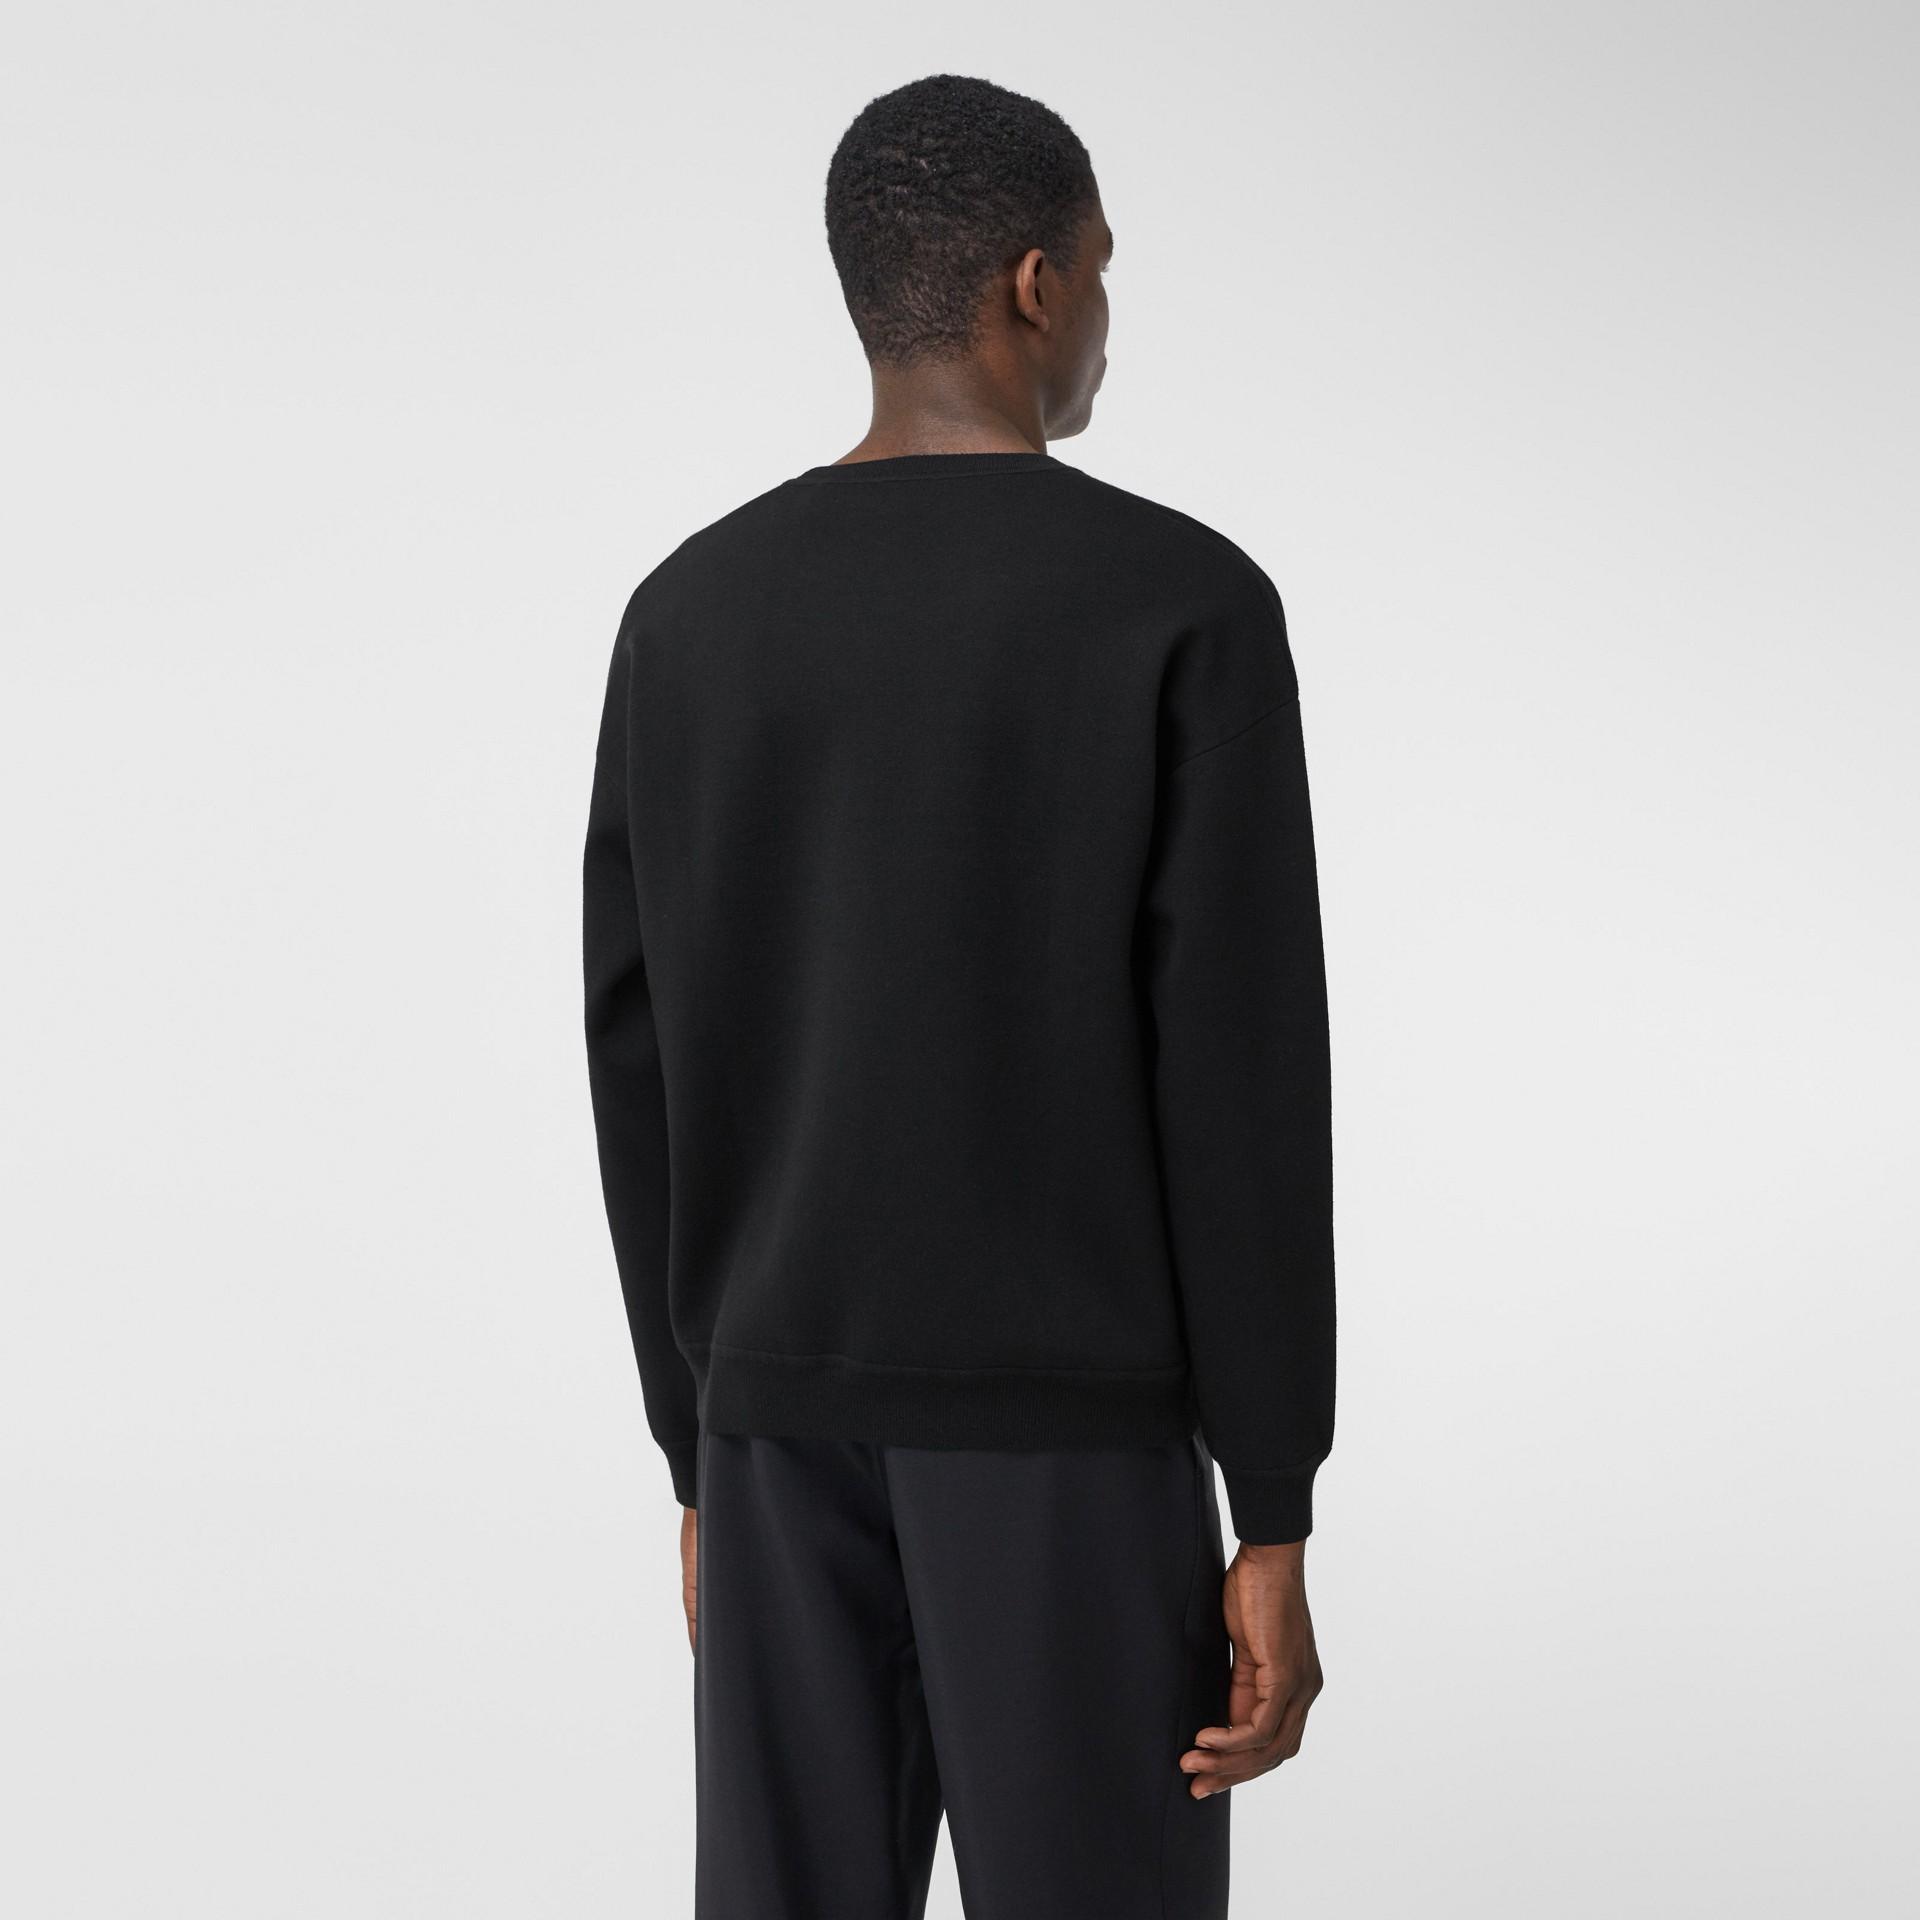 Slogan Intarsia Merino Wool Blend Sweater in Black - Men | Burberry United States - gallery image 2